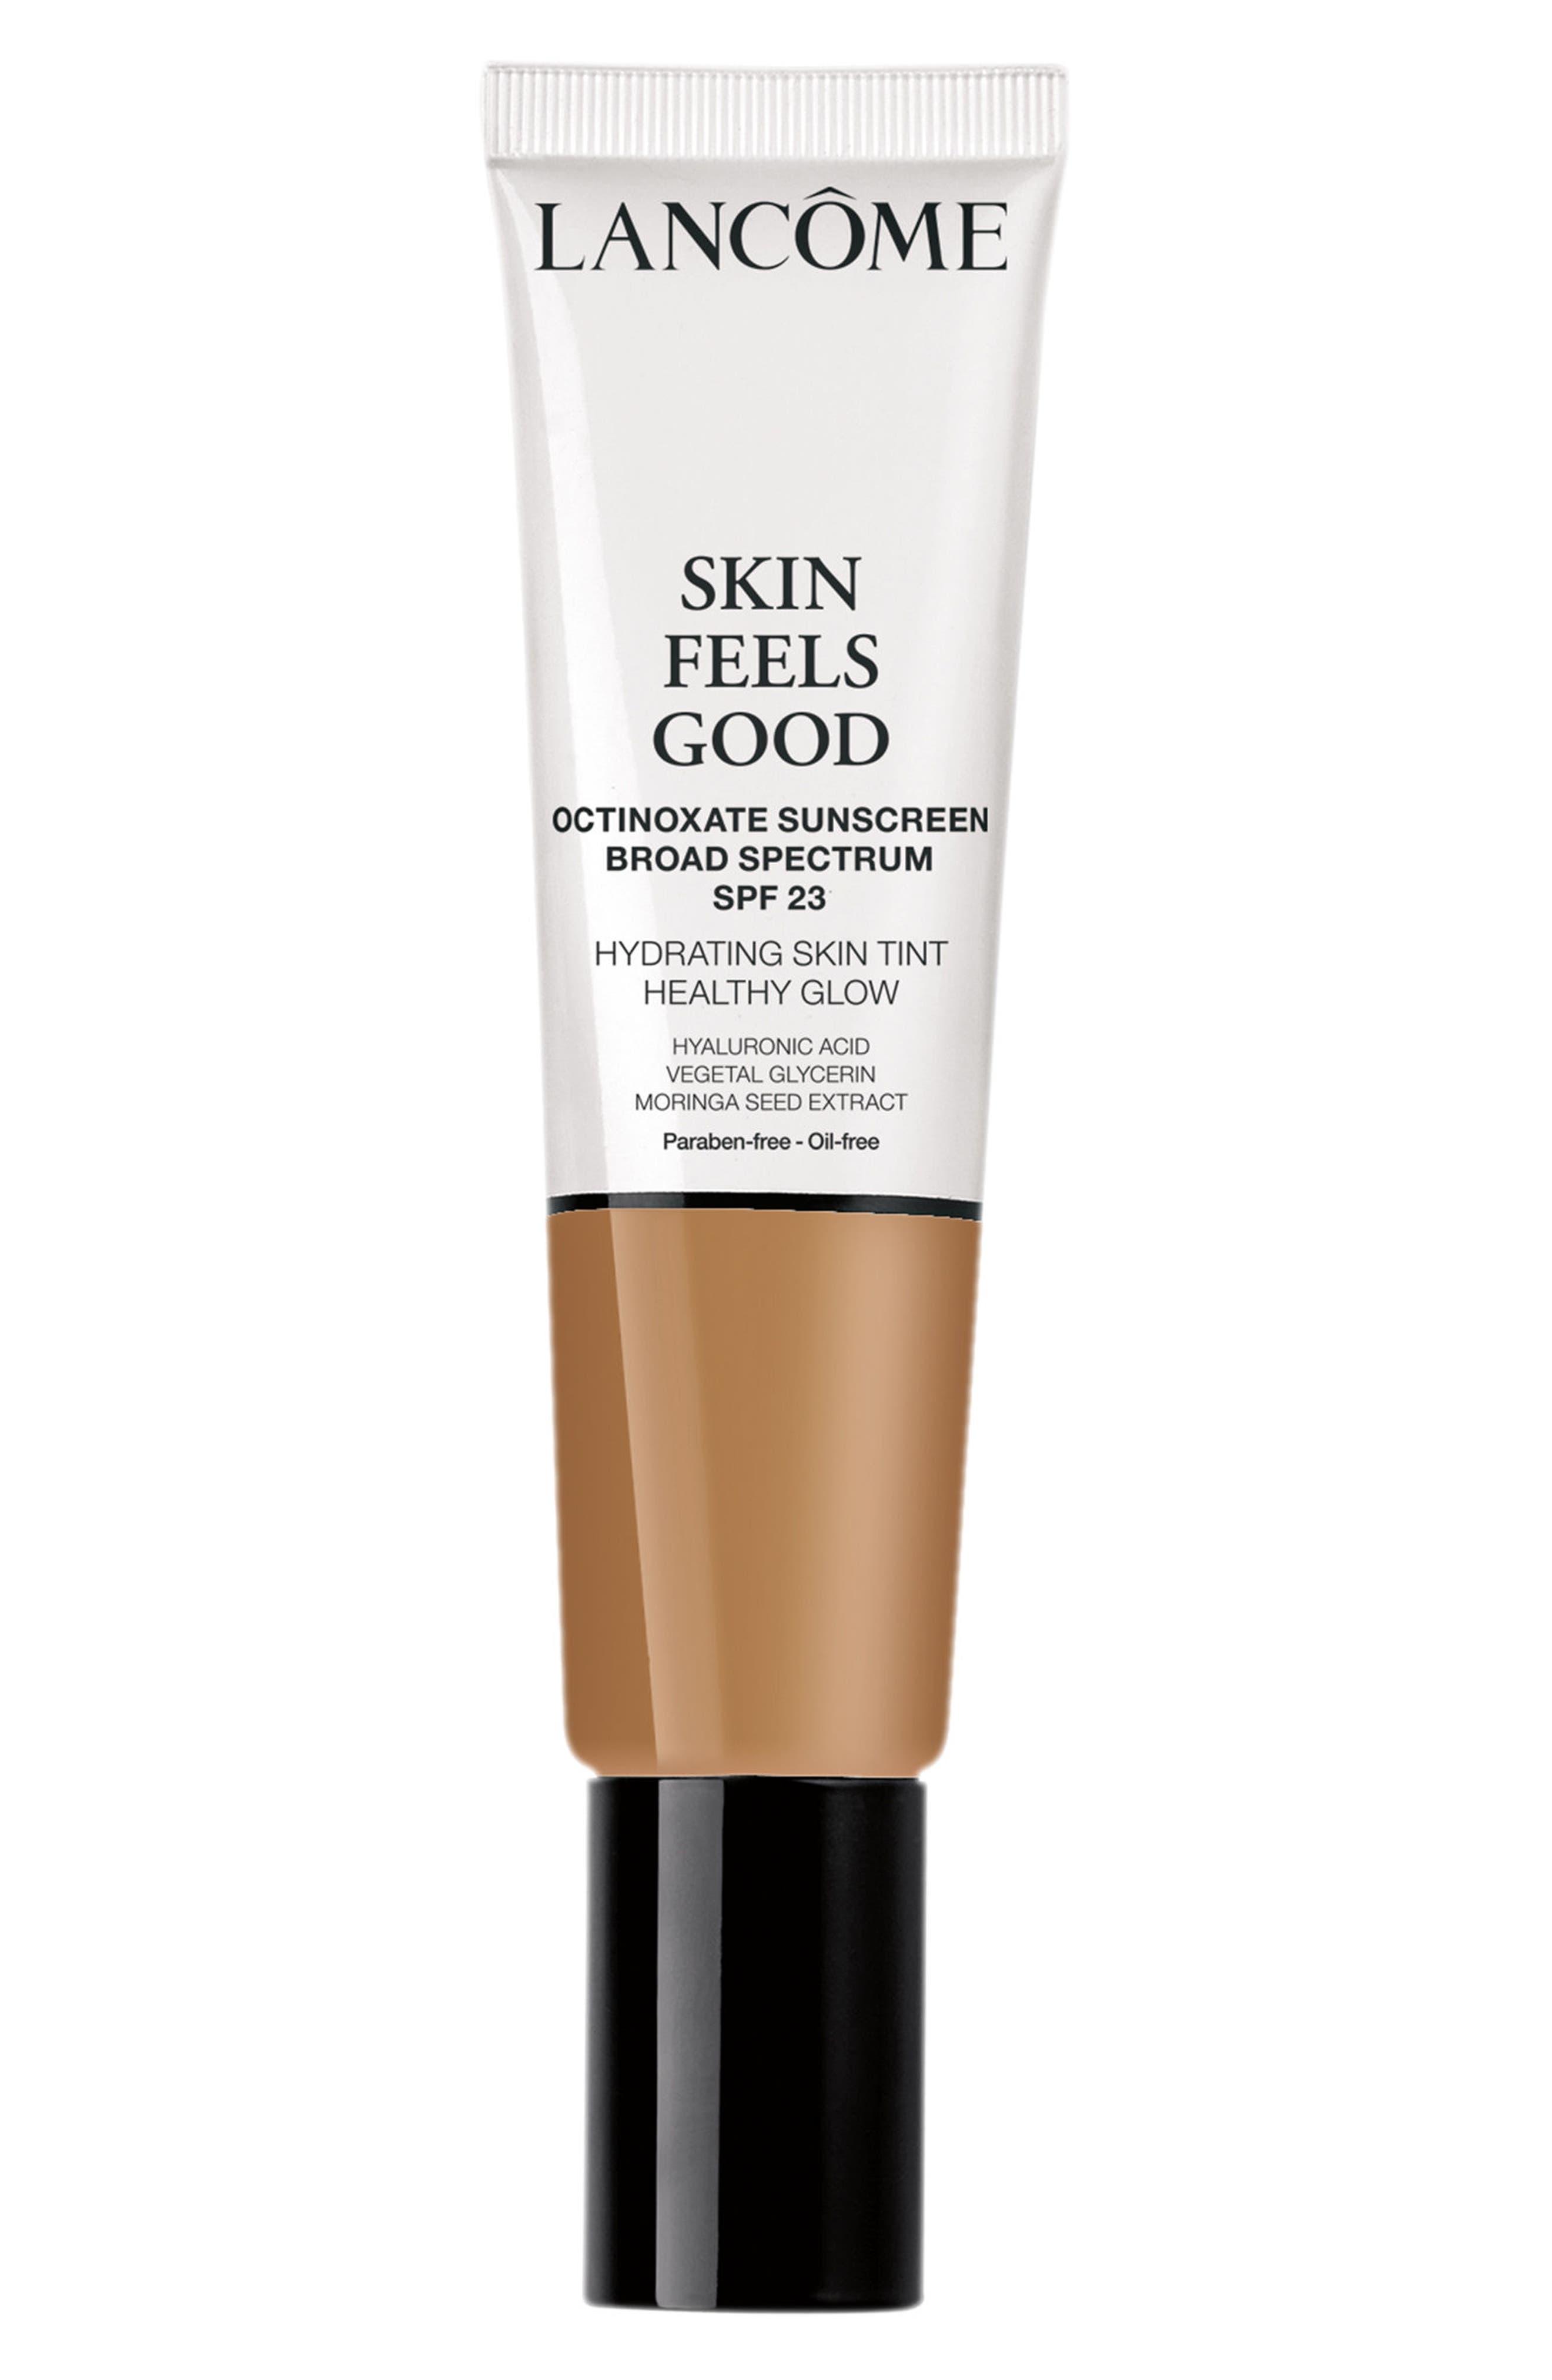 Skin Feels Good Hydrating Skin Tint Healthy Glow SPF 23,                             Main thumbnail 1, color,                             08N SWEET HONEY